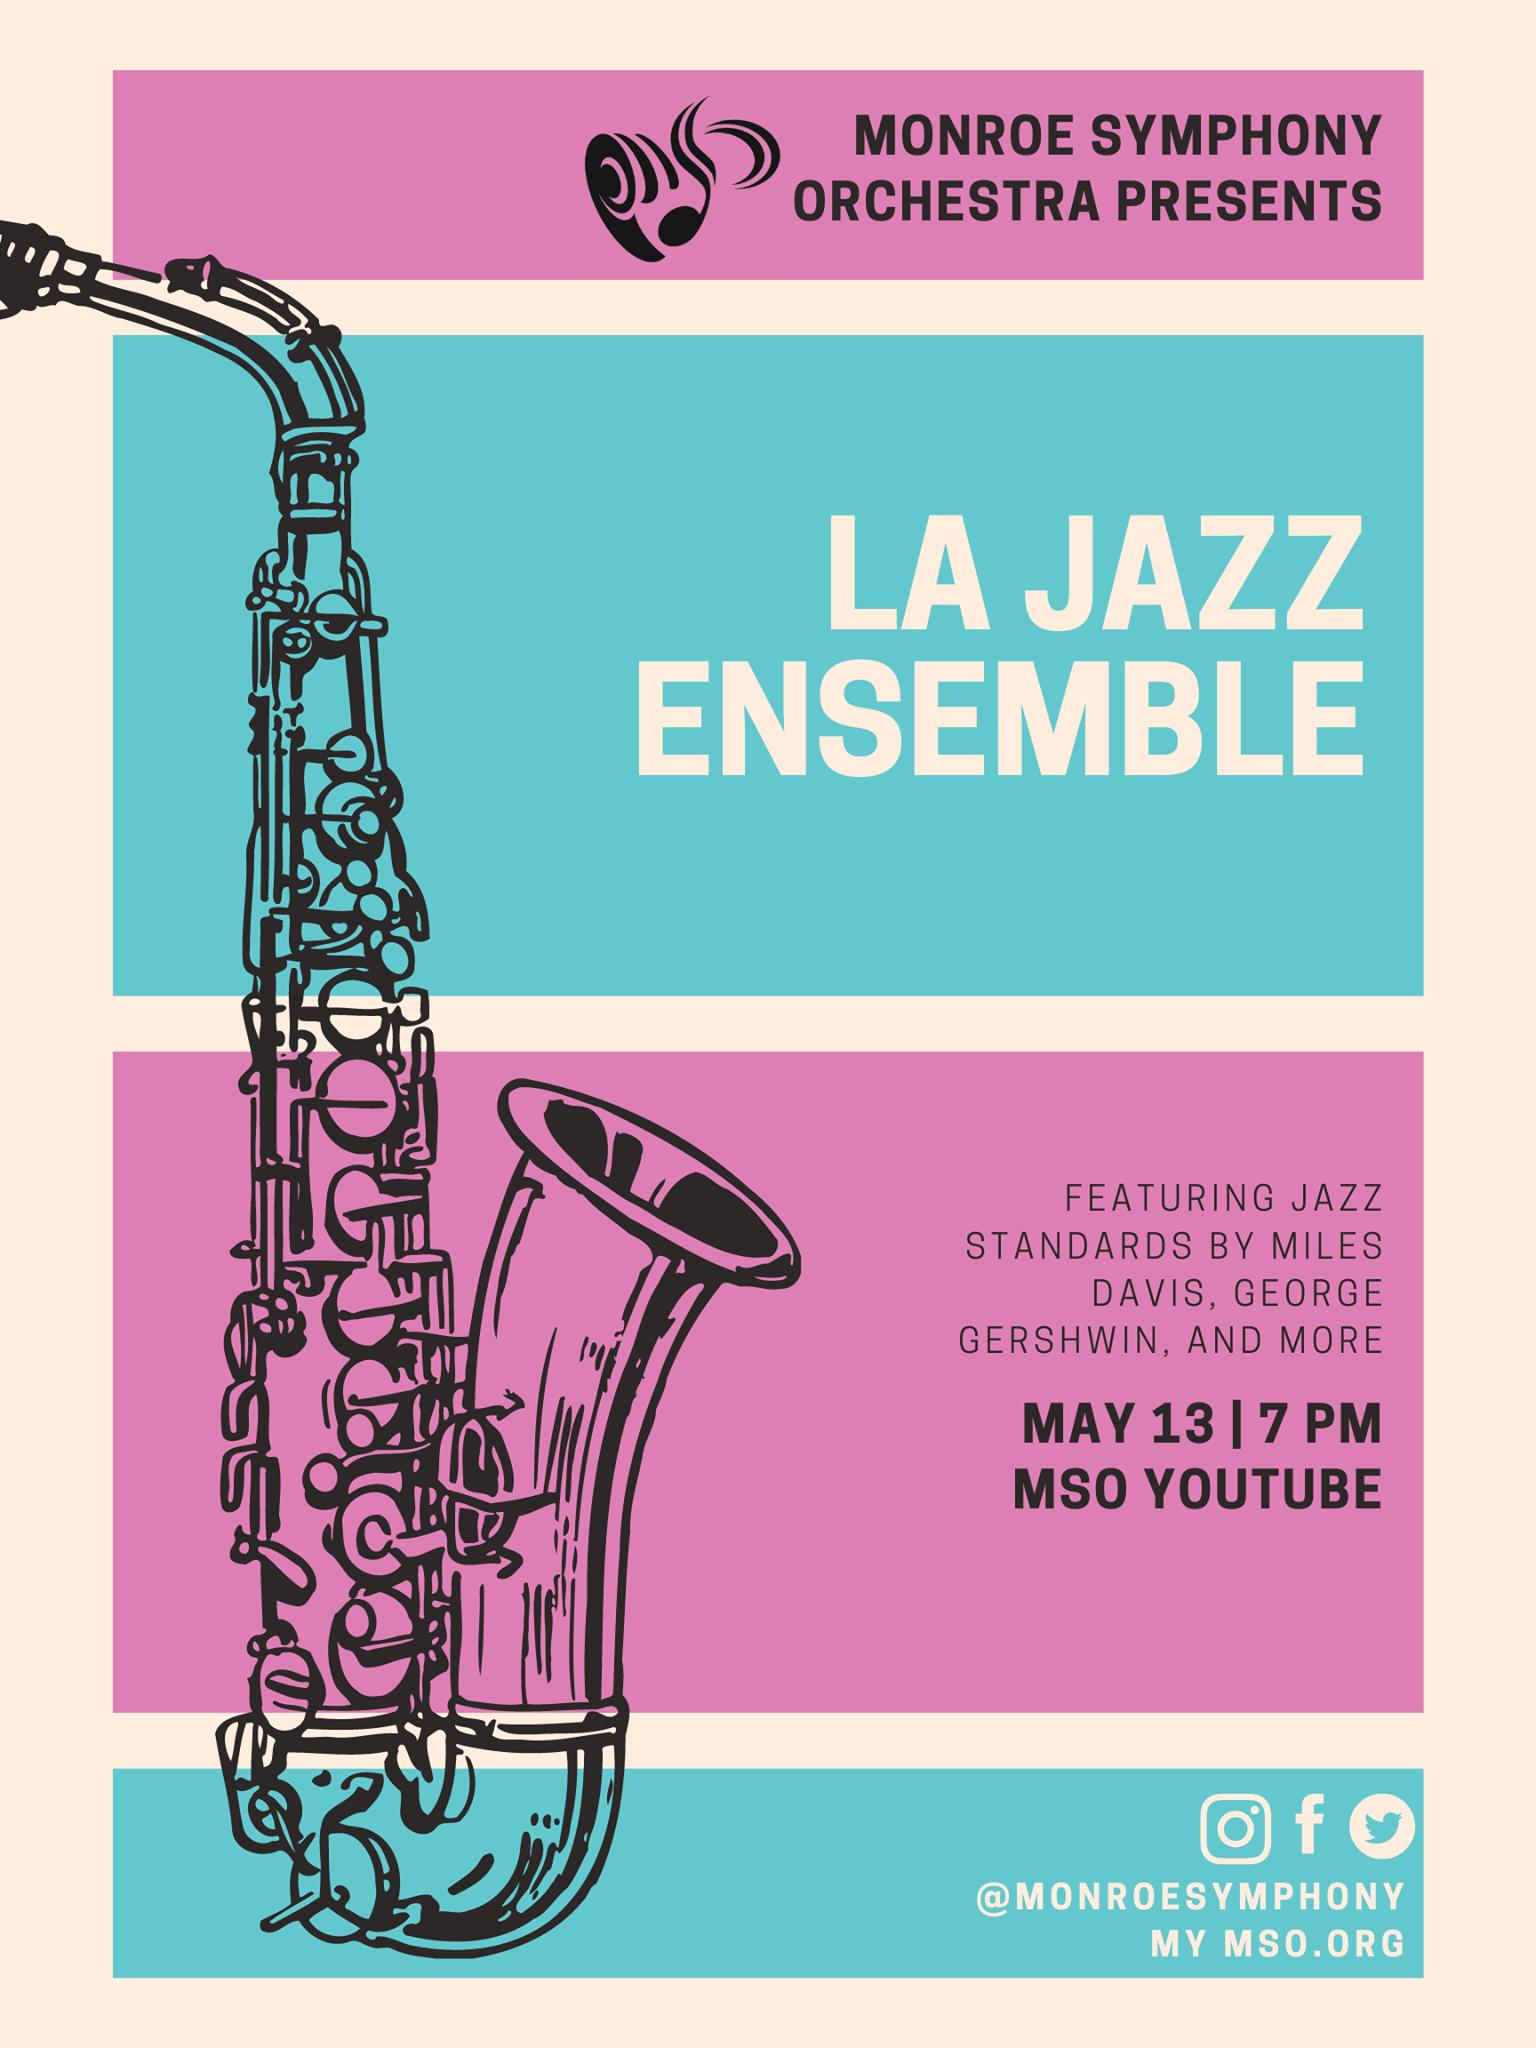 Monroe Symphony Orchestra Presents: An Evening of Jazz Standards